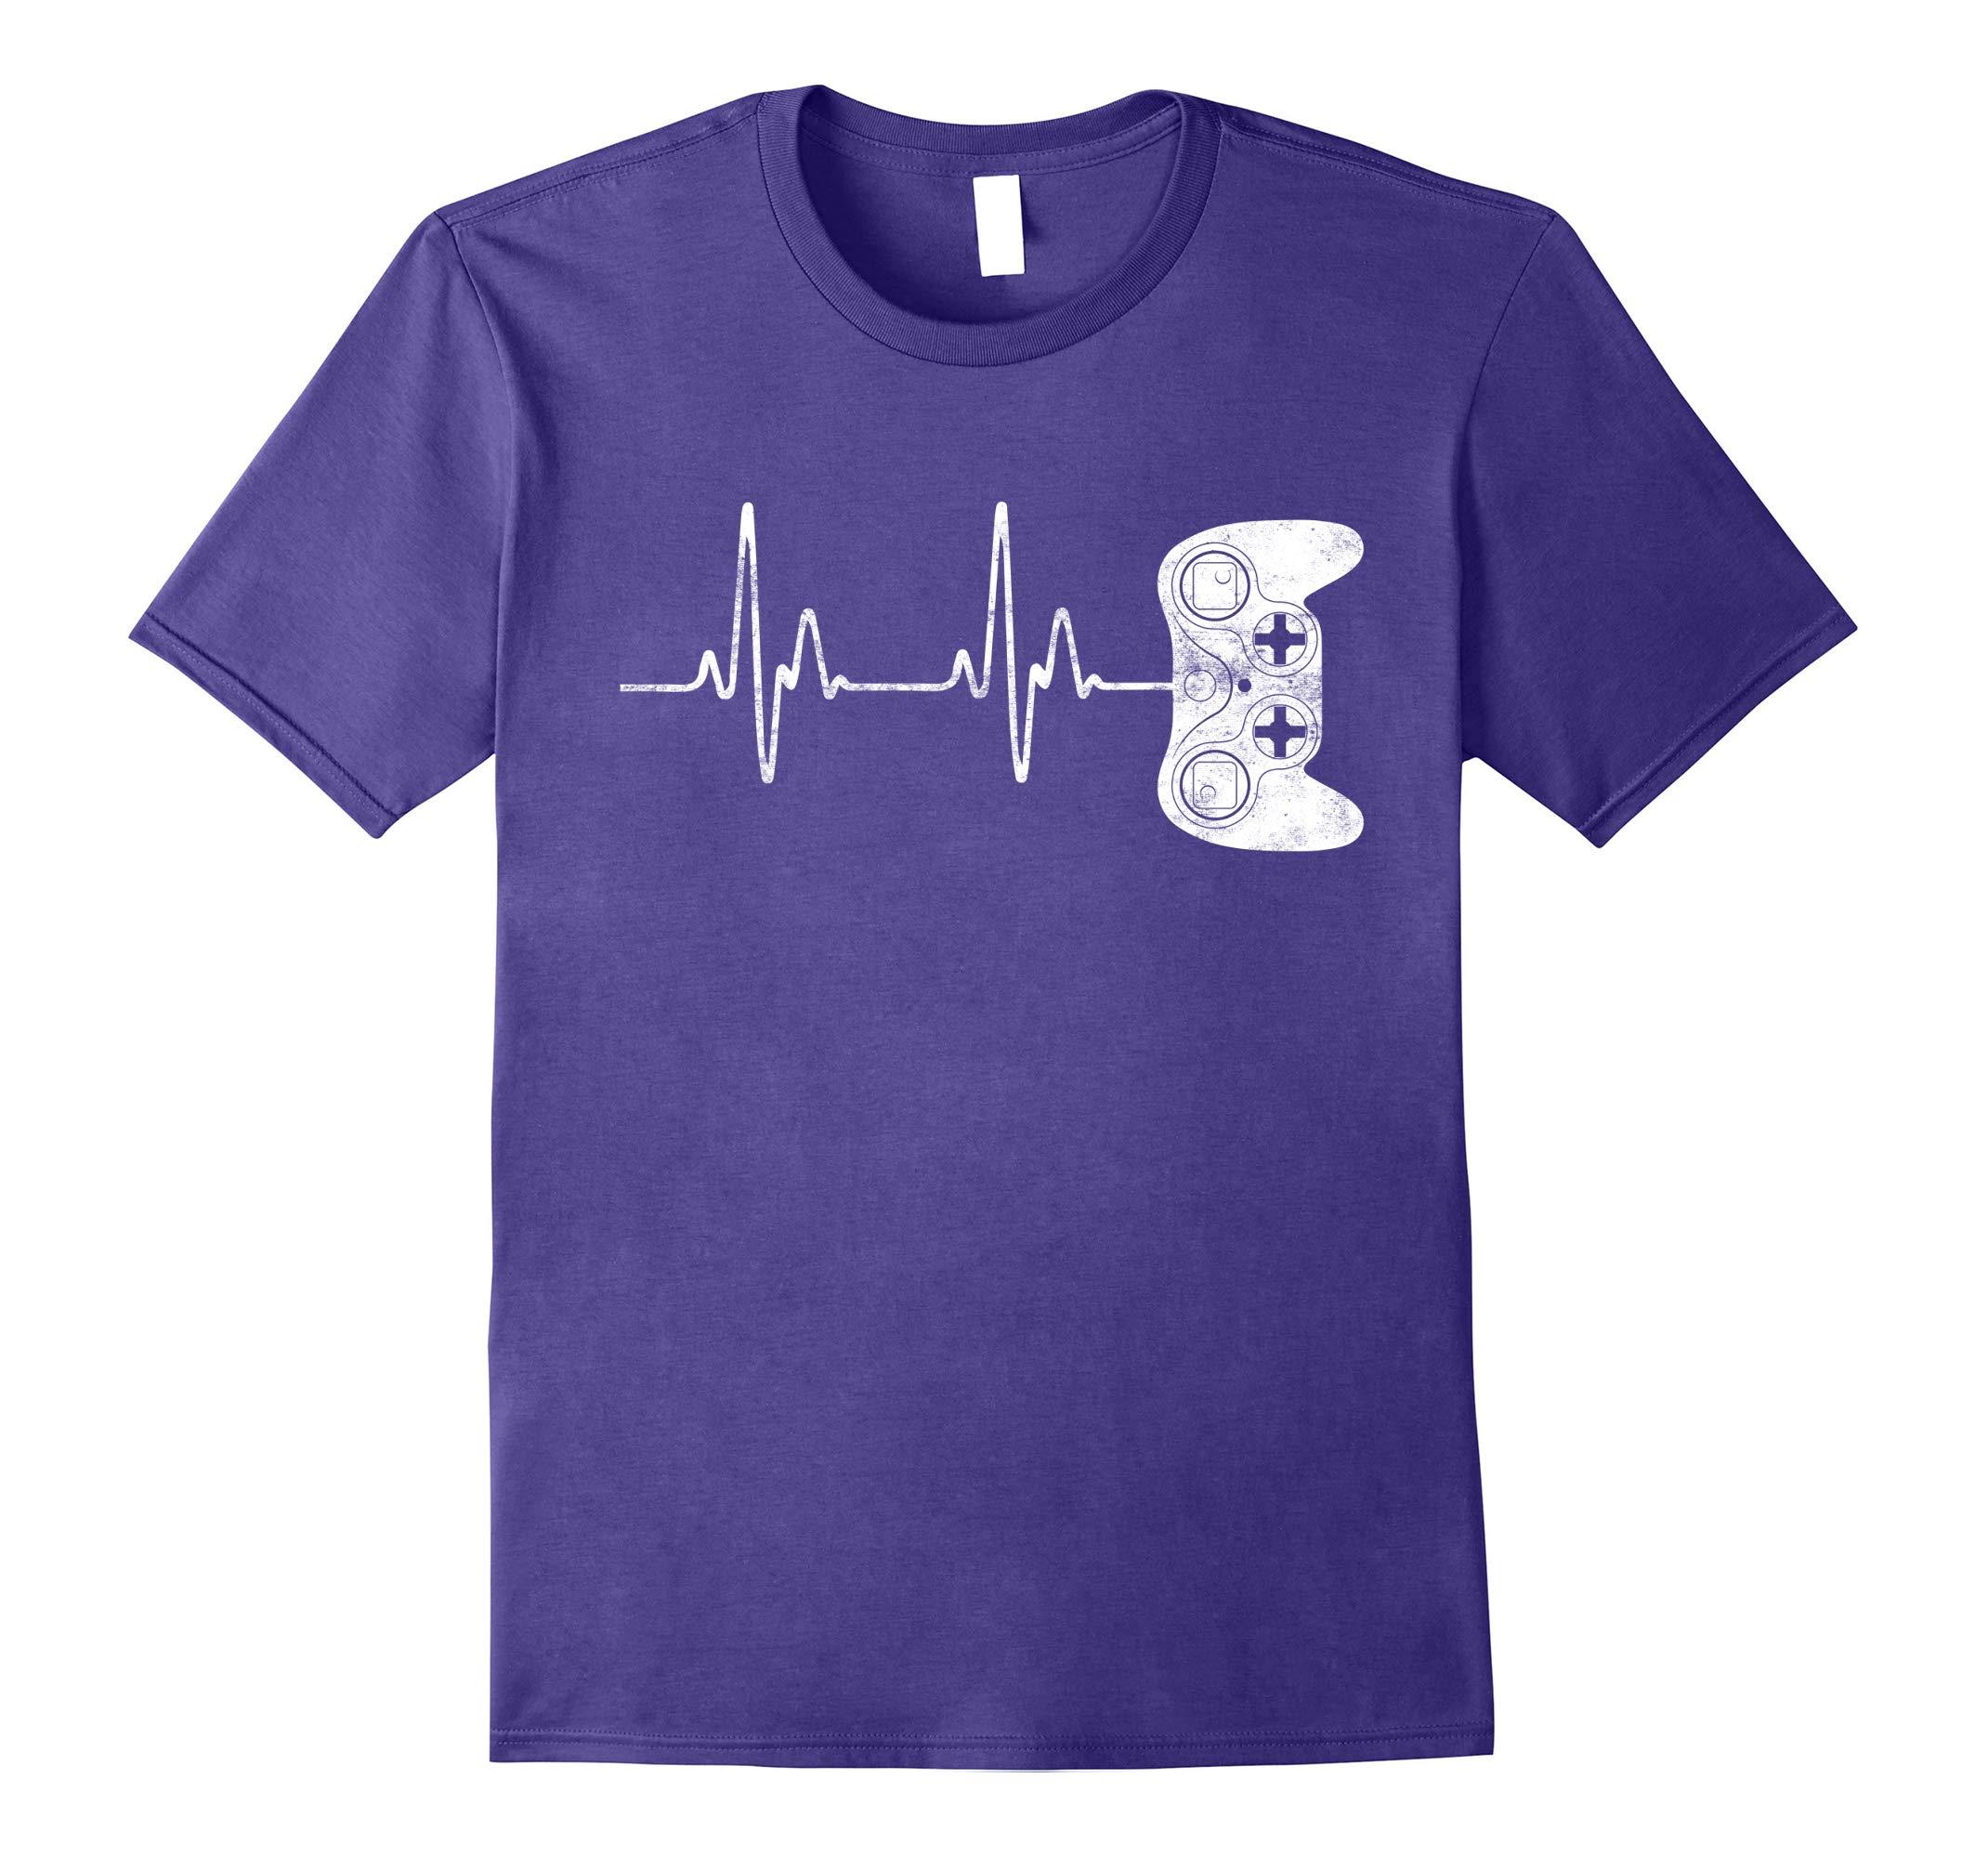 Gamer Heartbeat T-Shirt Video Game Lover Gift Shirt-RT